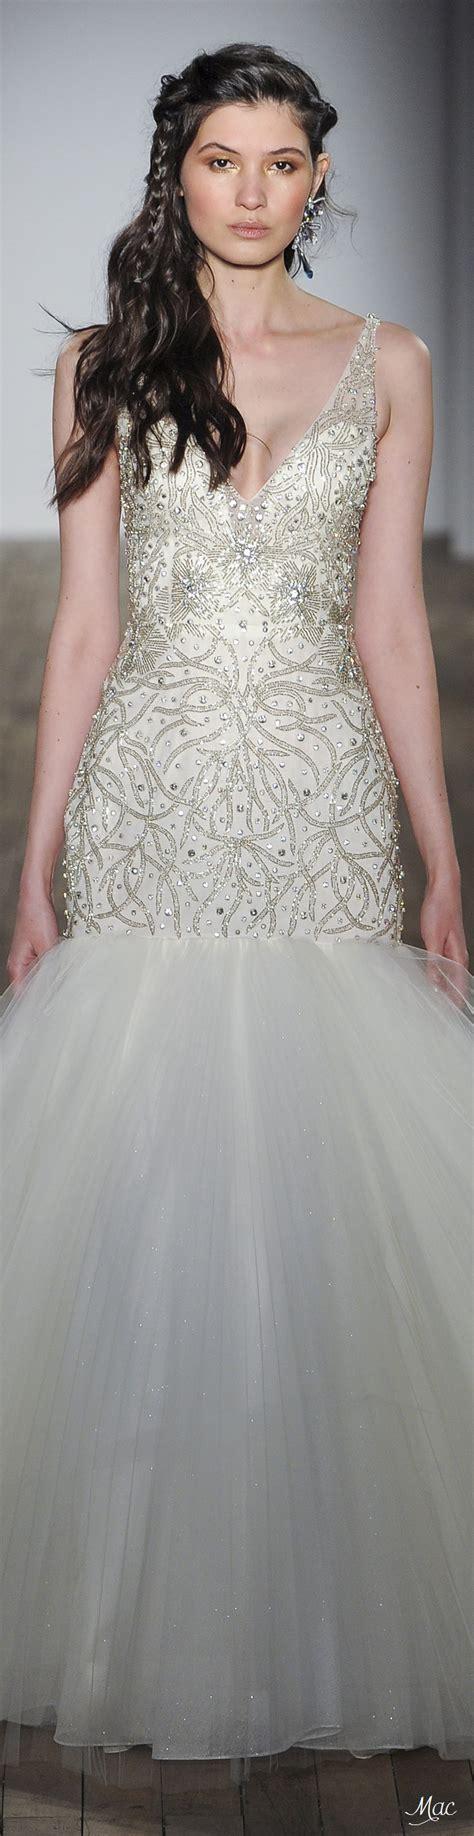 Spring 2018 Bridal JLM Couture | Bridal couture, Bridal ...